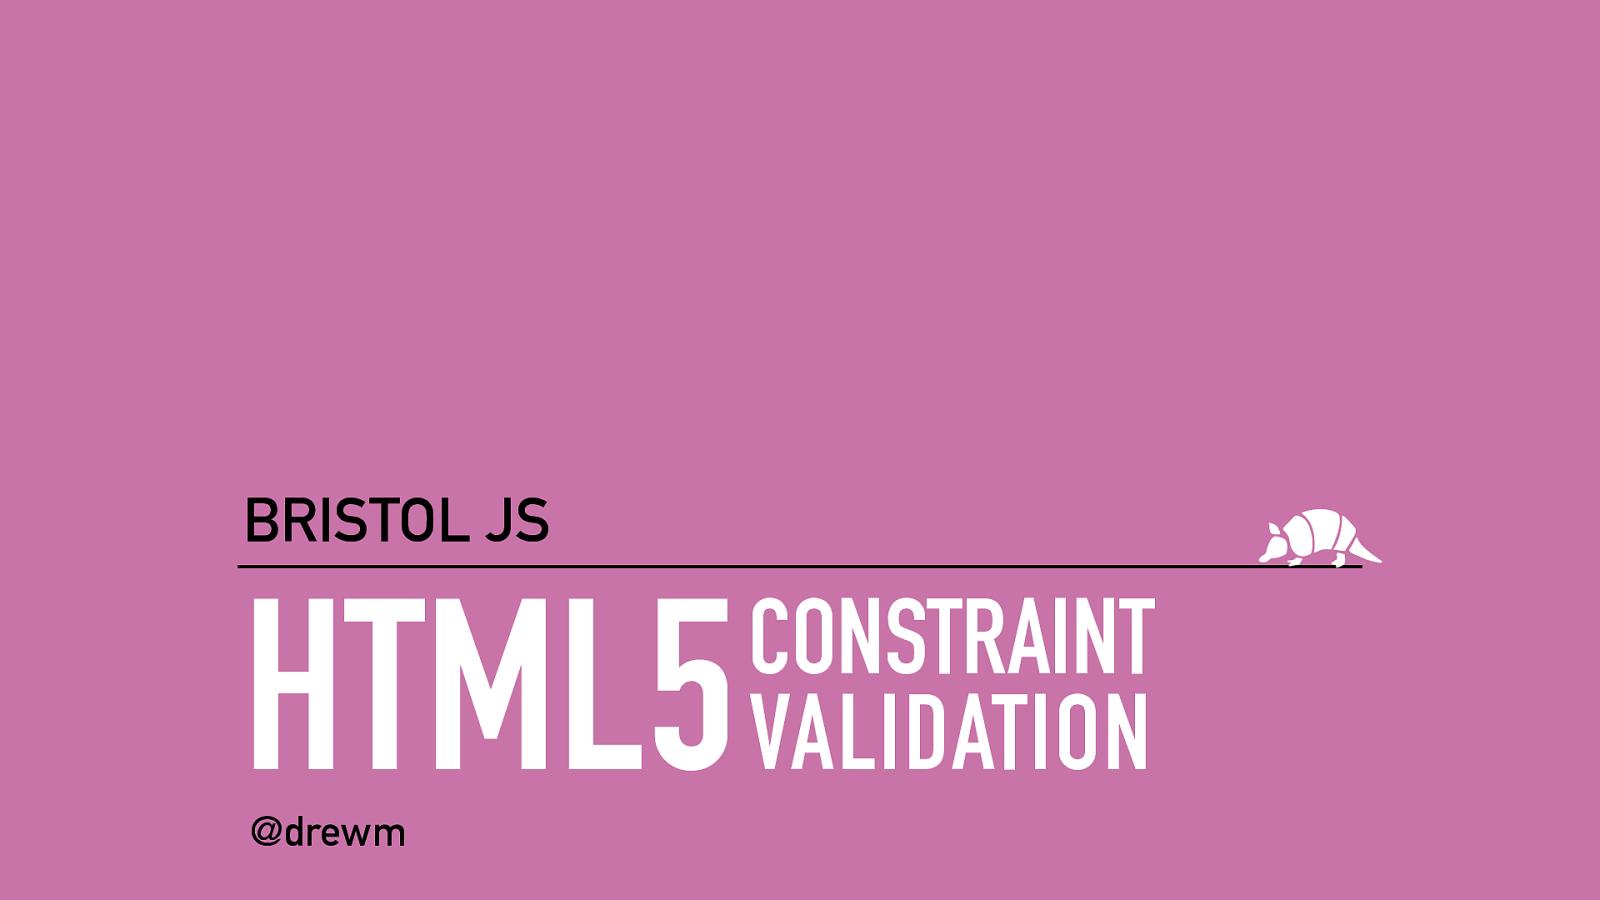 HTML5 Constraint Validation